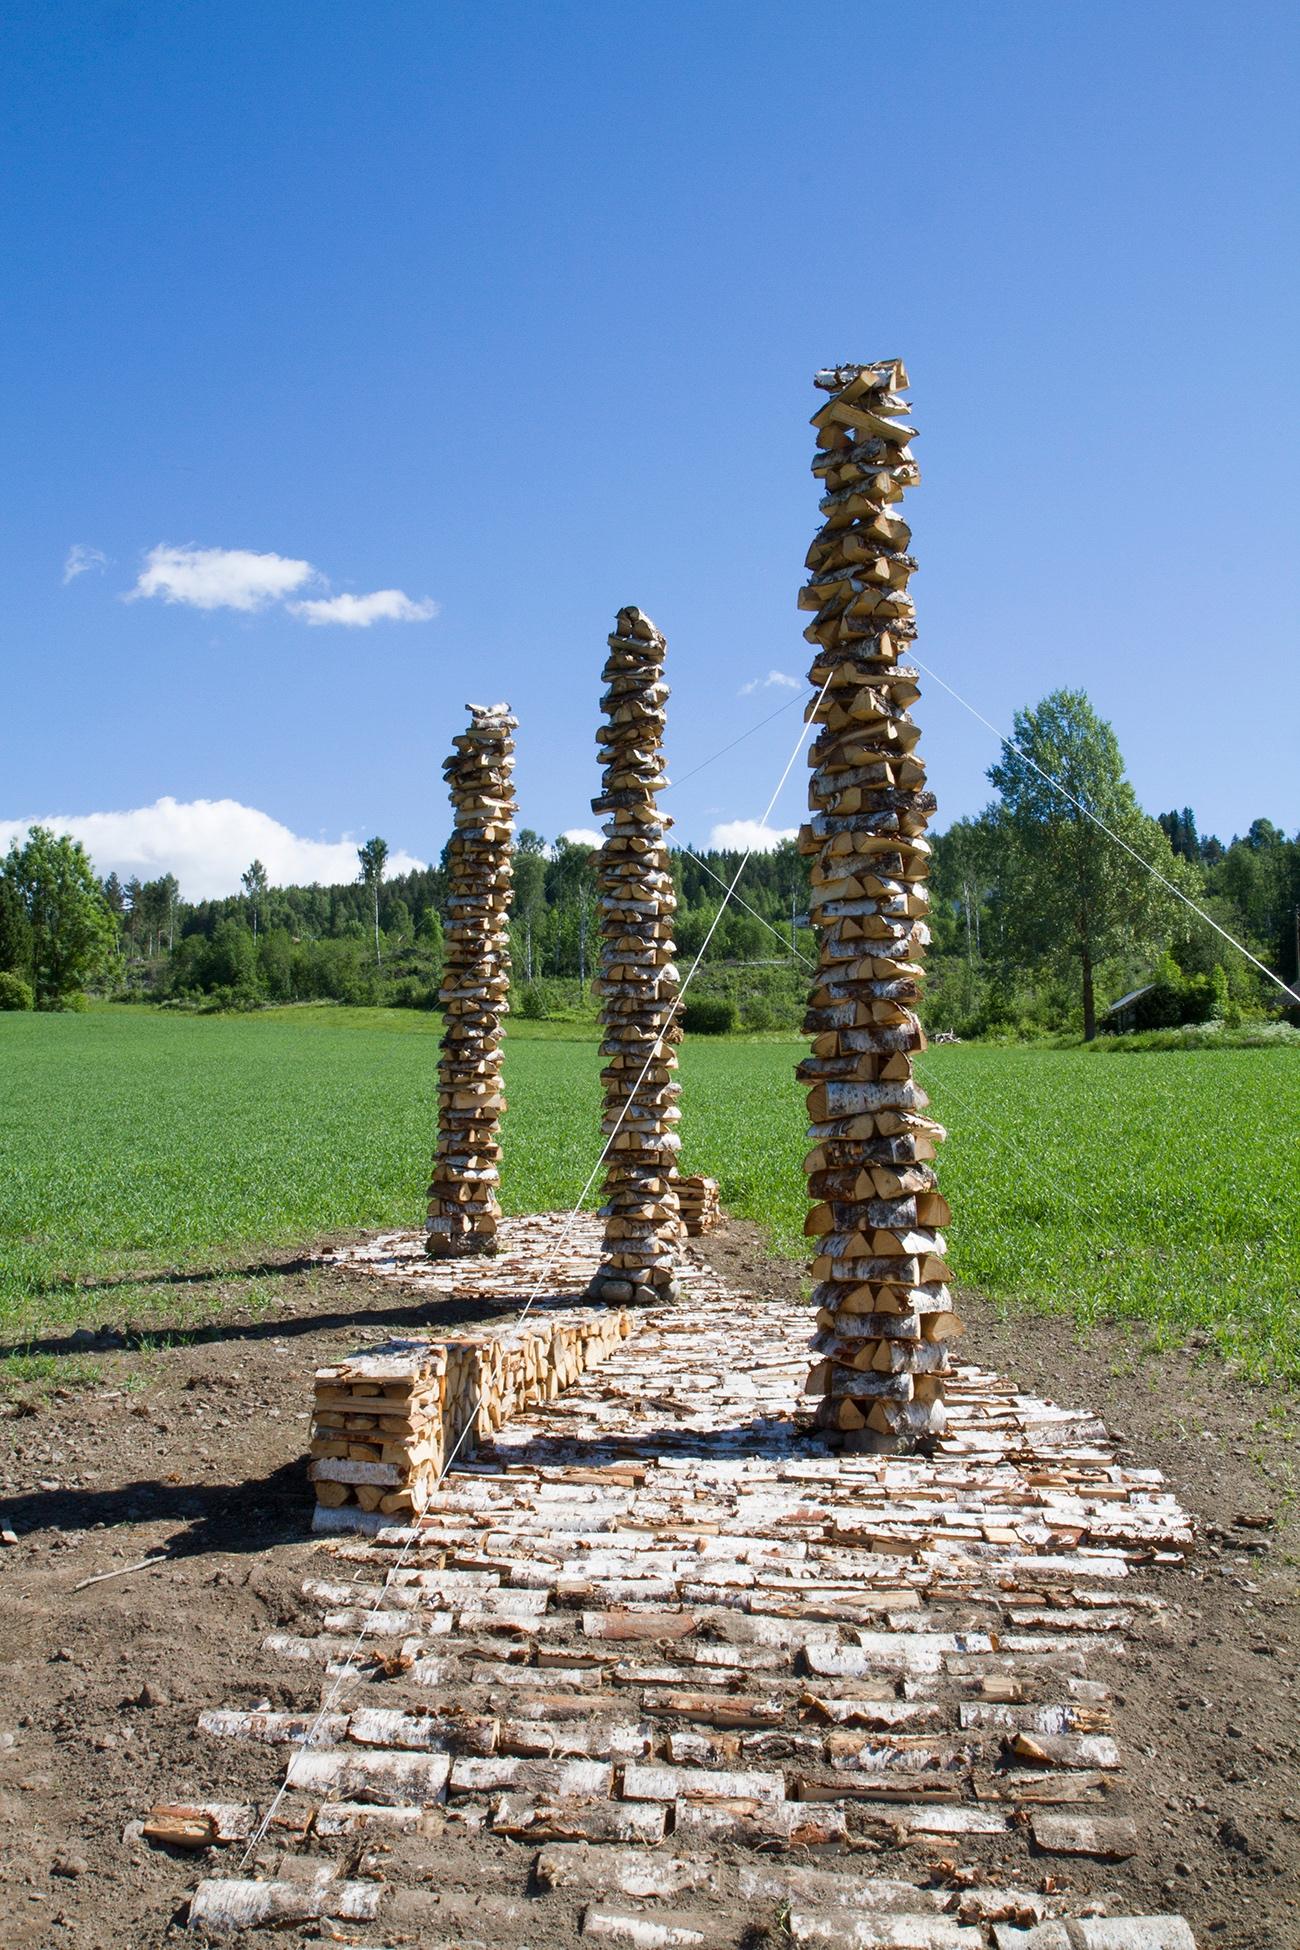 2014: LOGO – Sami Rintala / Daggur Eggertsson